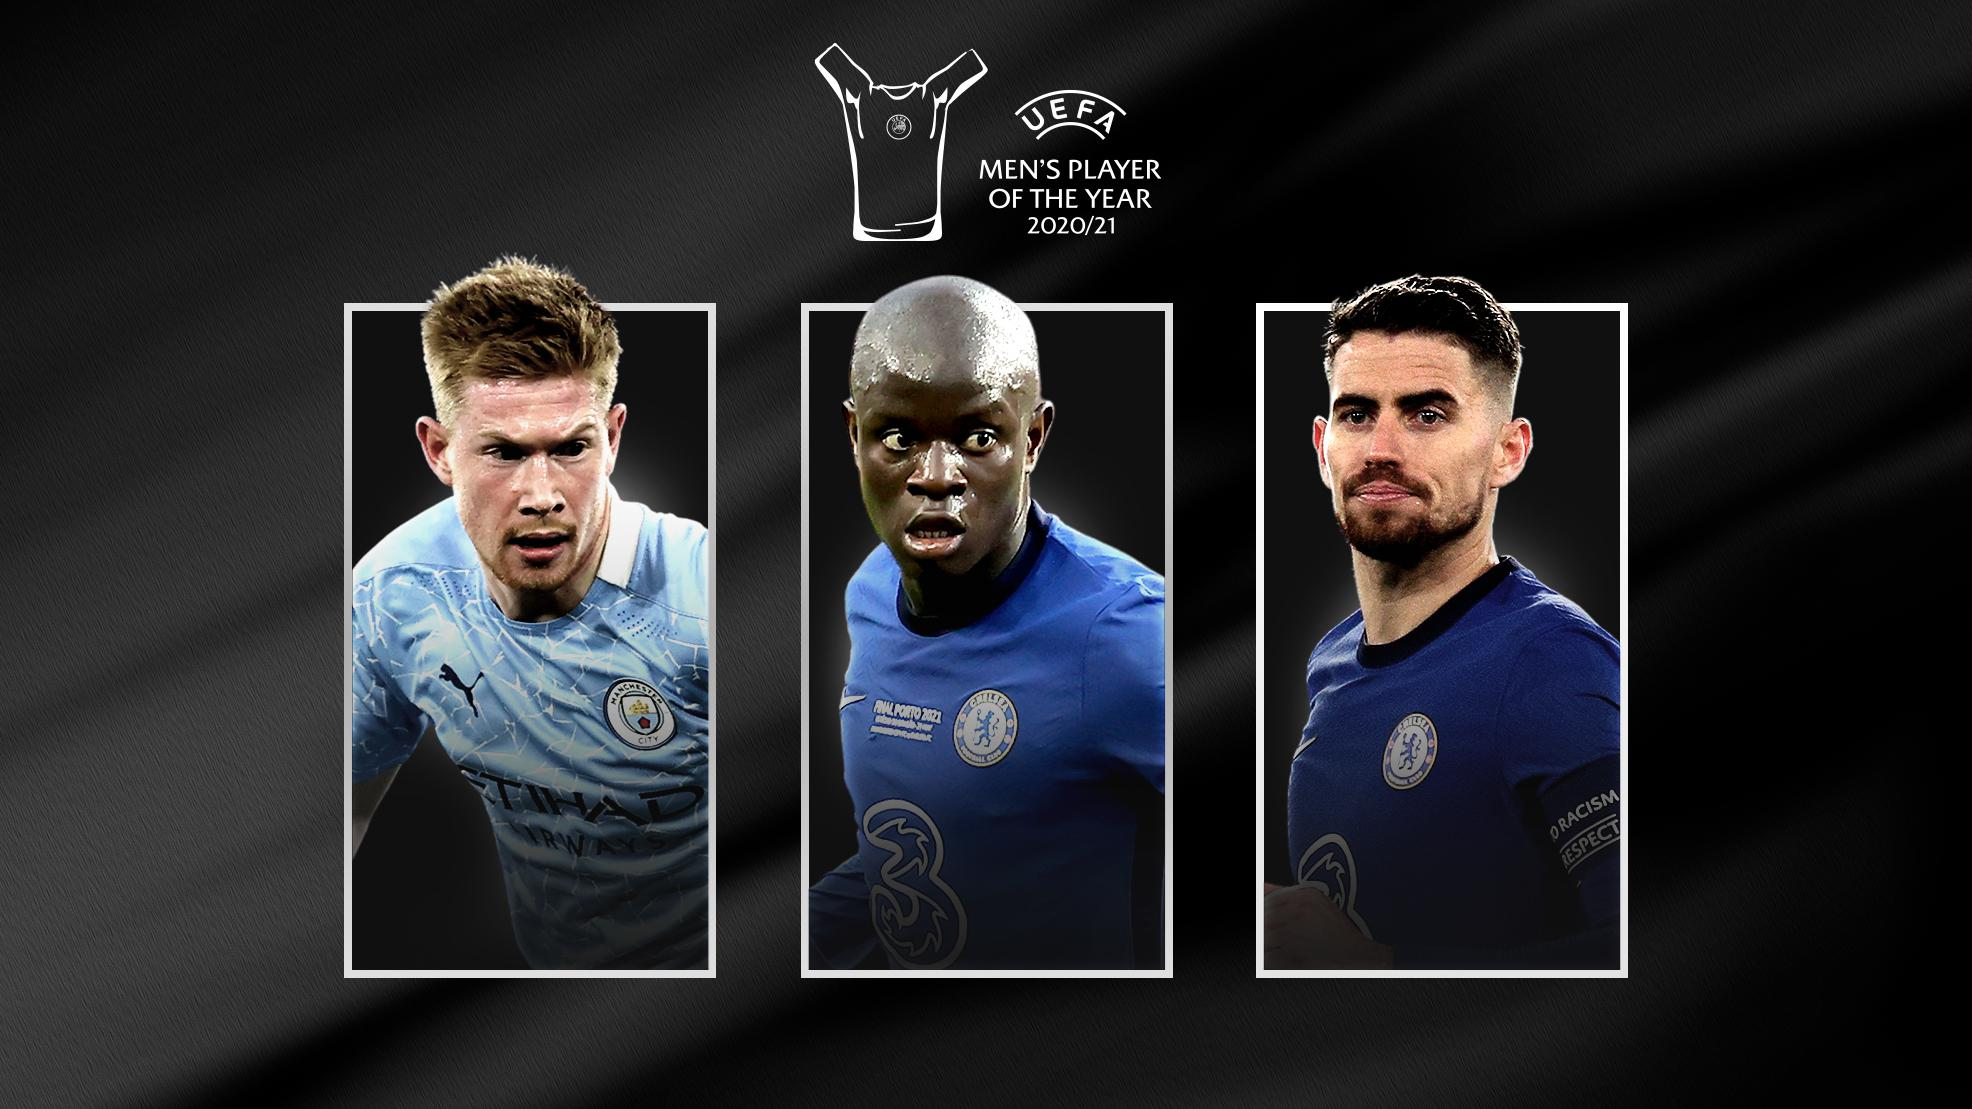 UEFA Player of the Year Award